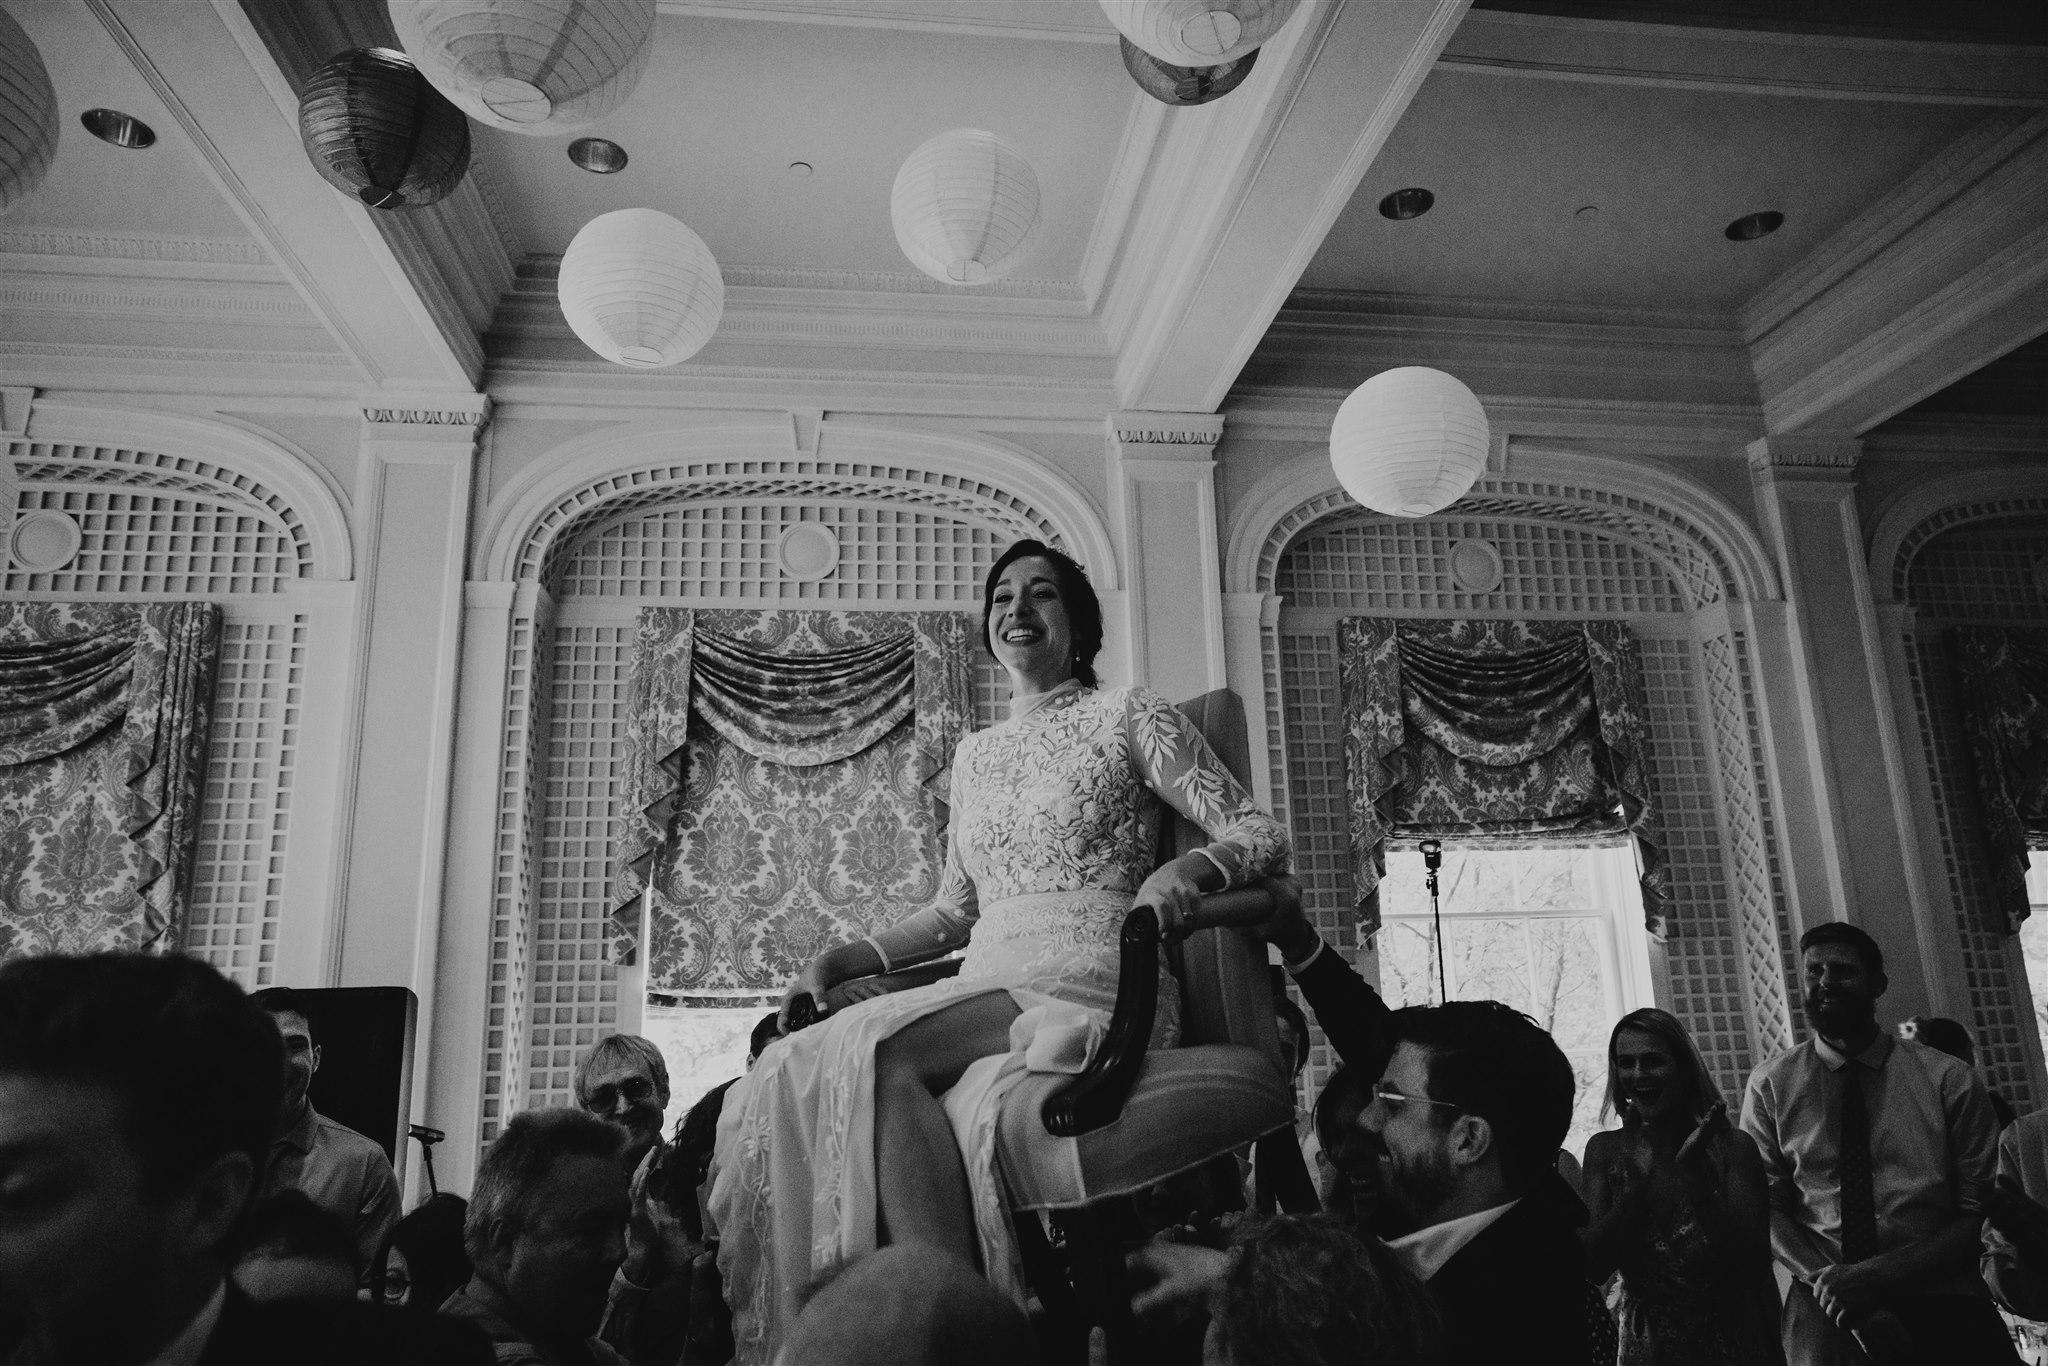 Chellise_Michael_Photography_Hudson_Valley_Wedding_Photographer_Otesaga_Hotel-6028.jpg